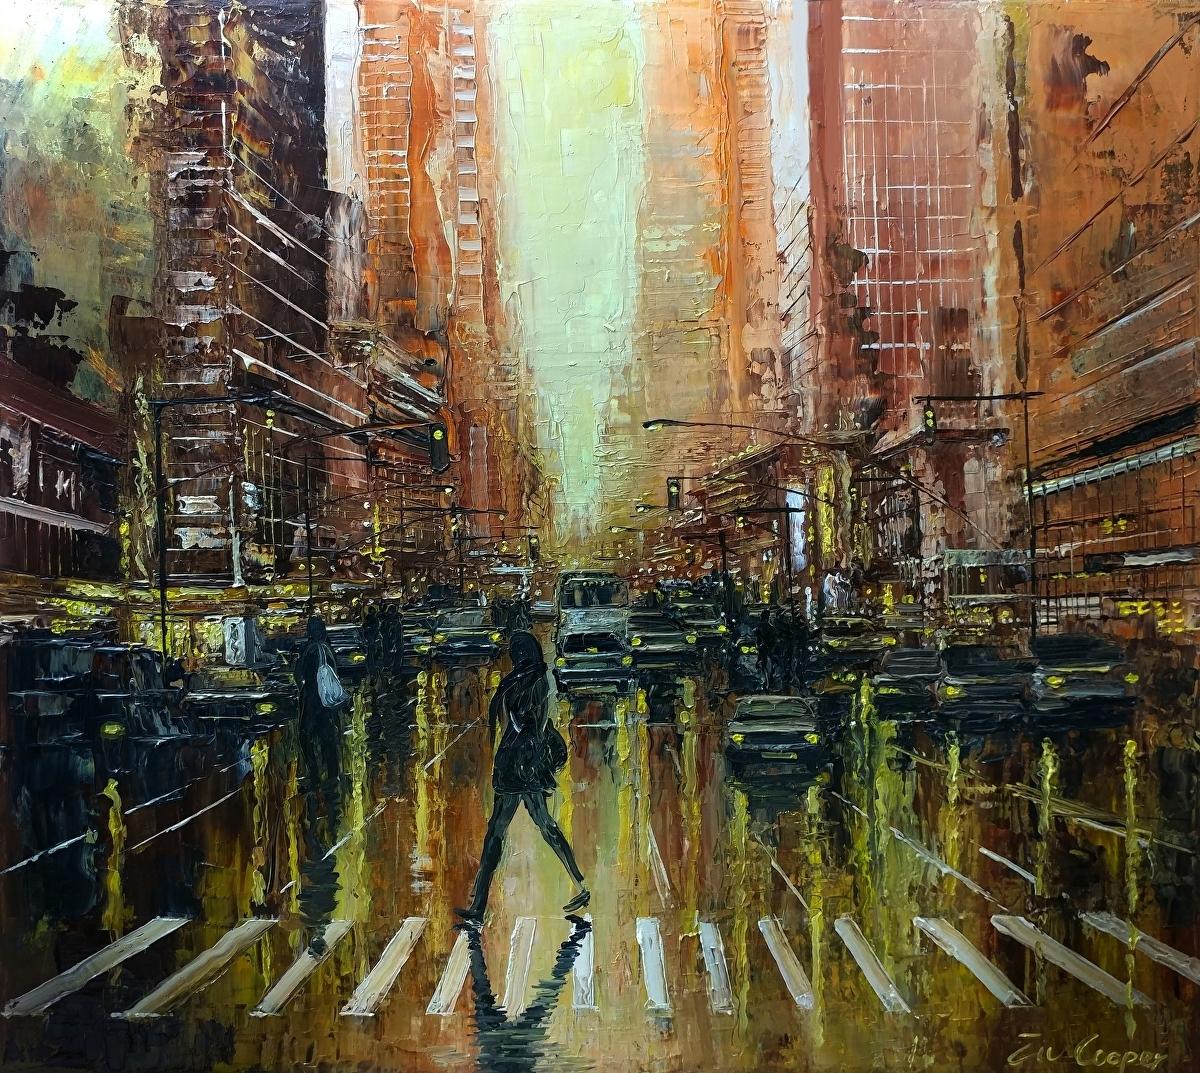 Ziv Cooper - Evening Reflections